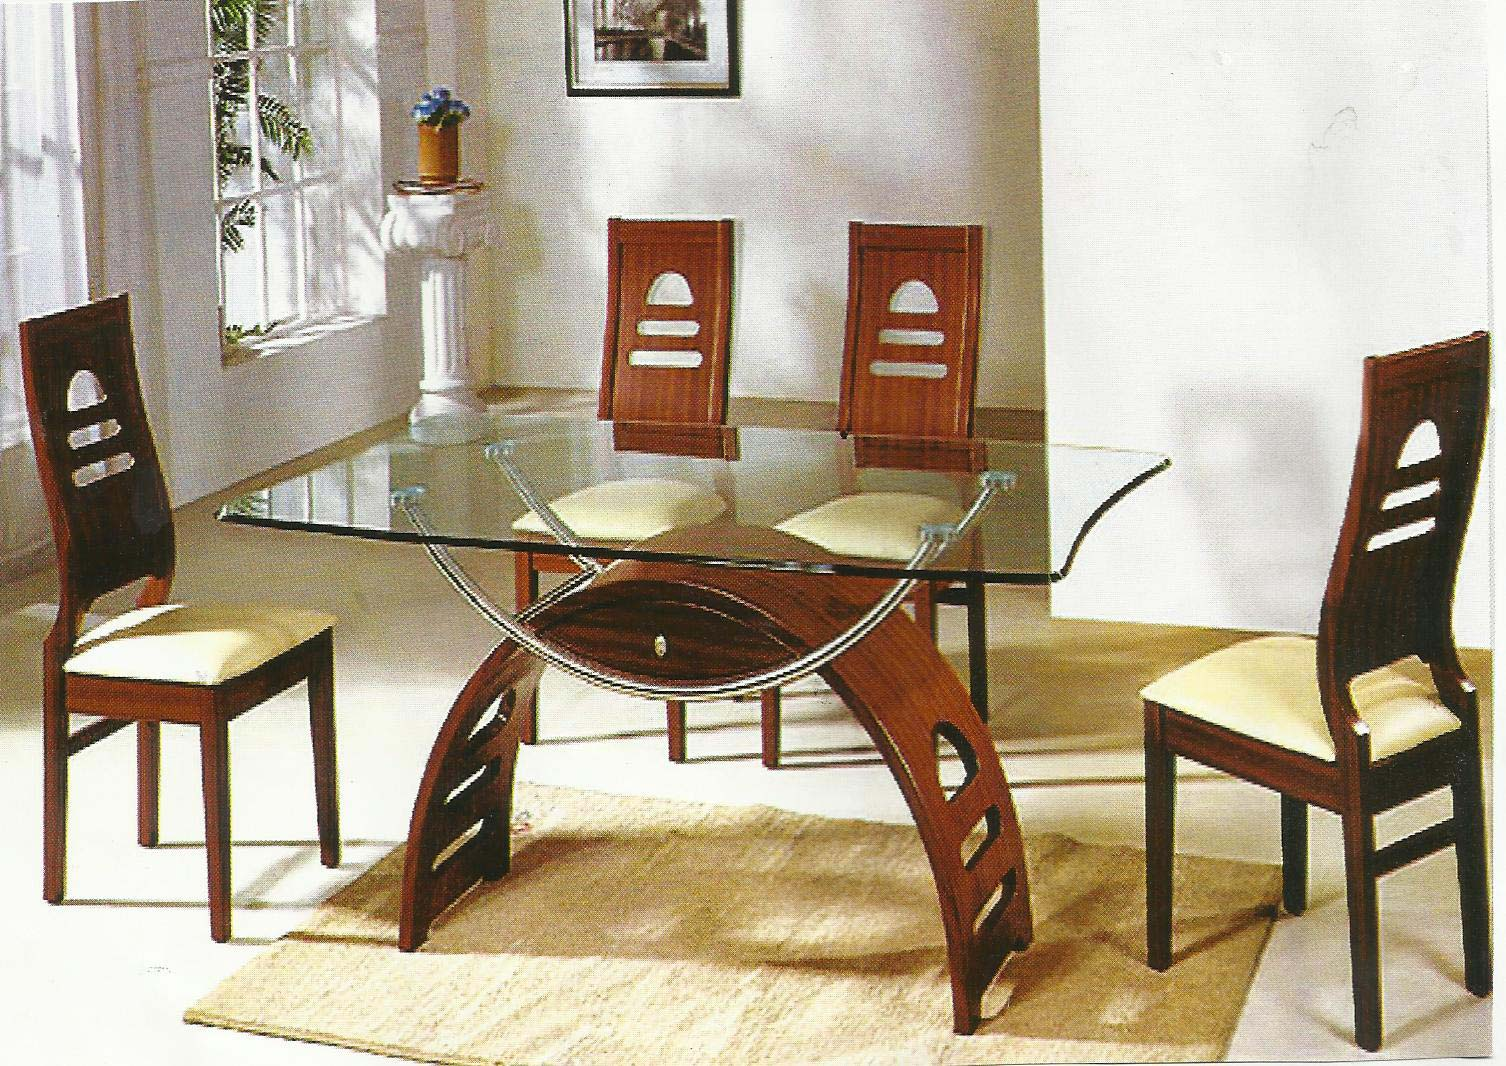 Kitchen Decor World Dining Table Modular Kitchen  : Avignon from kitchendecorworld.com size 1506 x 1066 jpeg 316kB